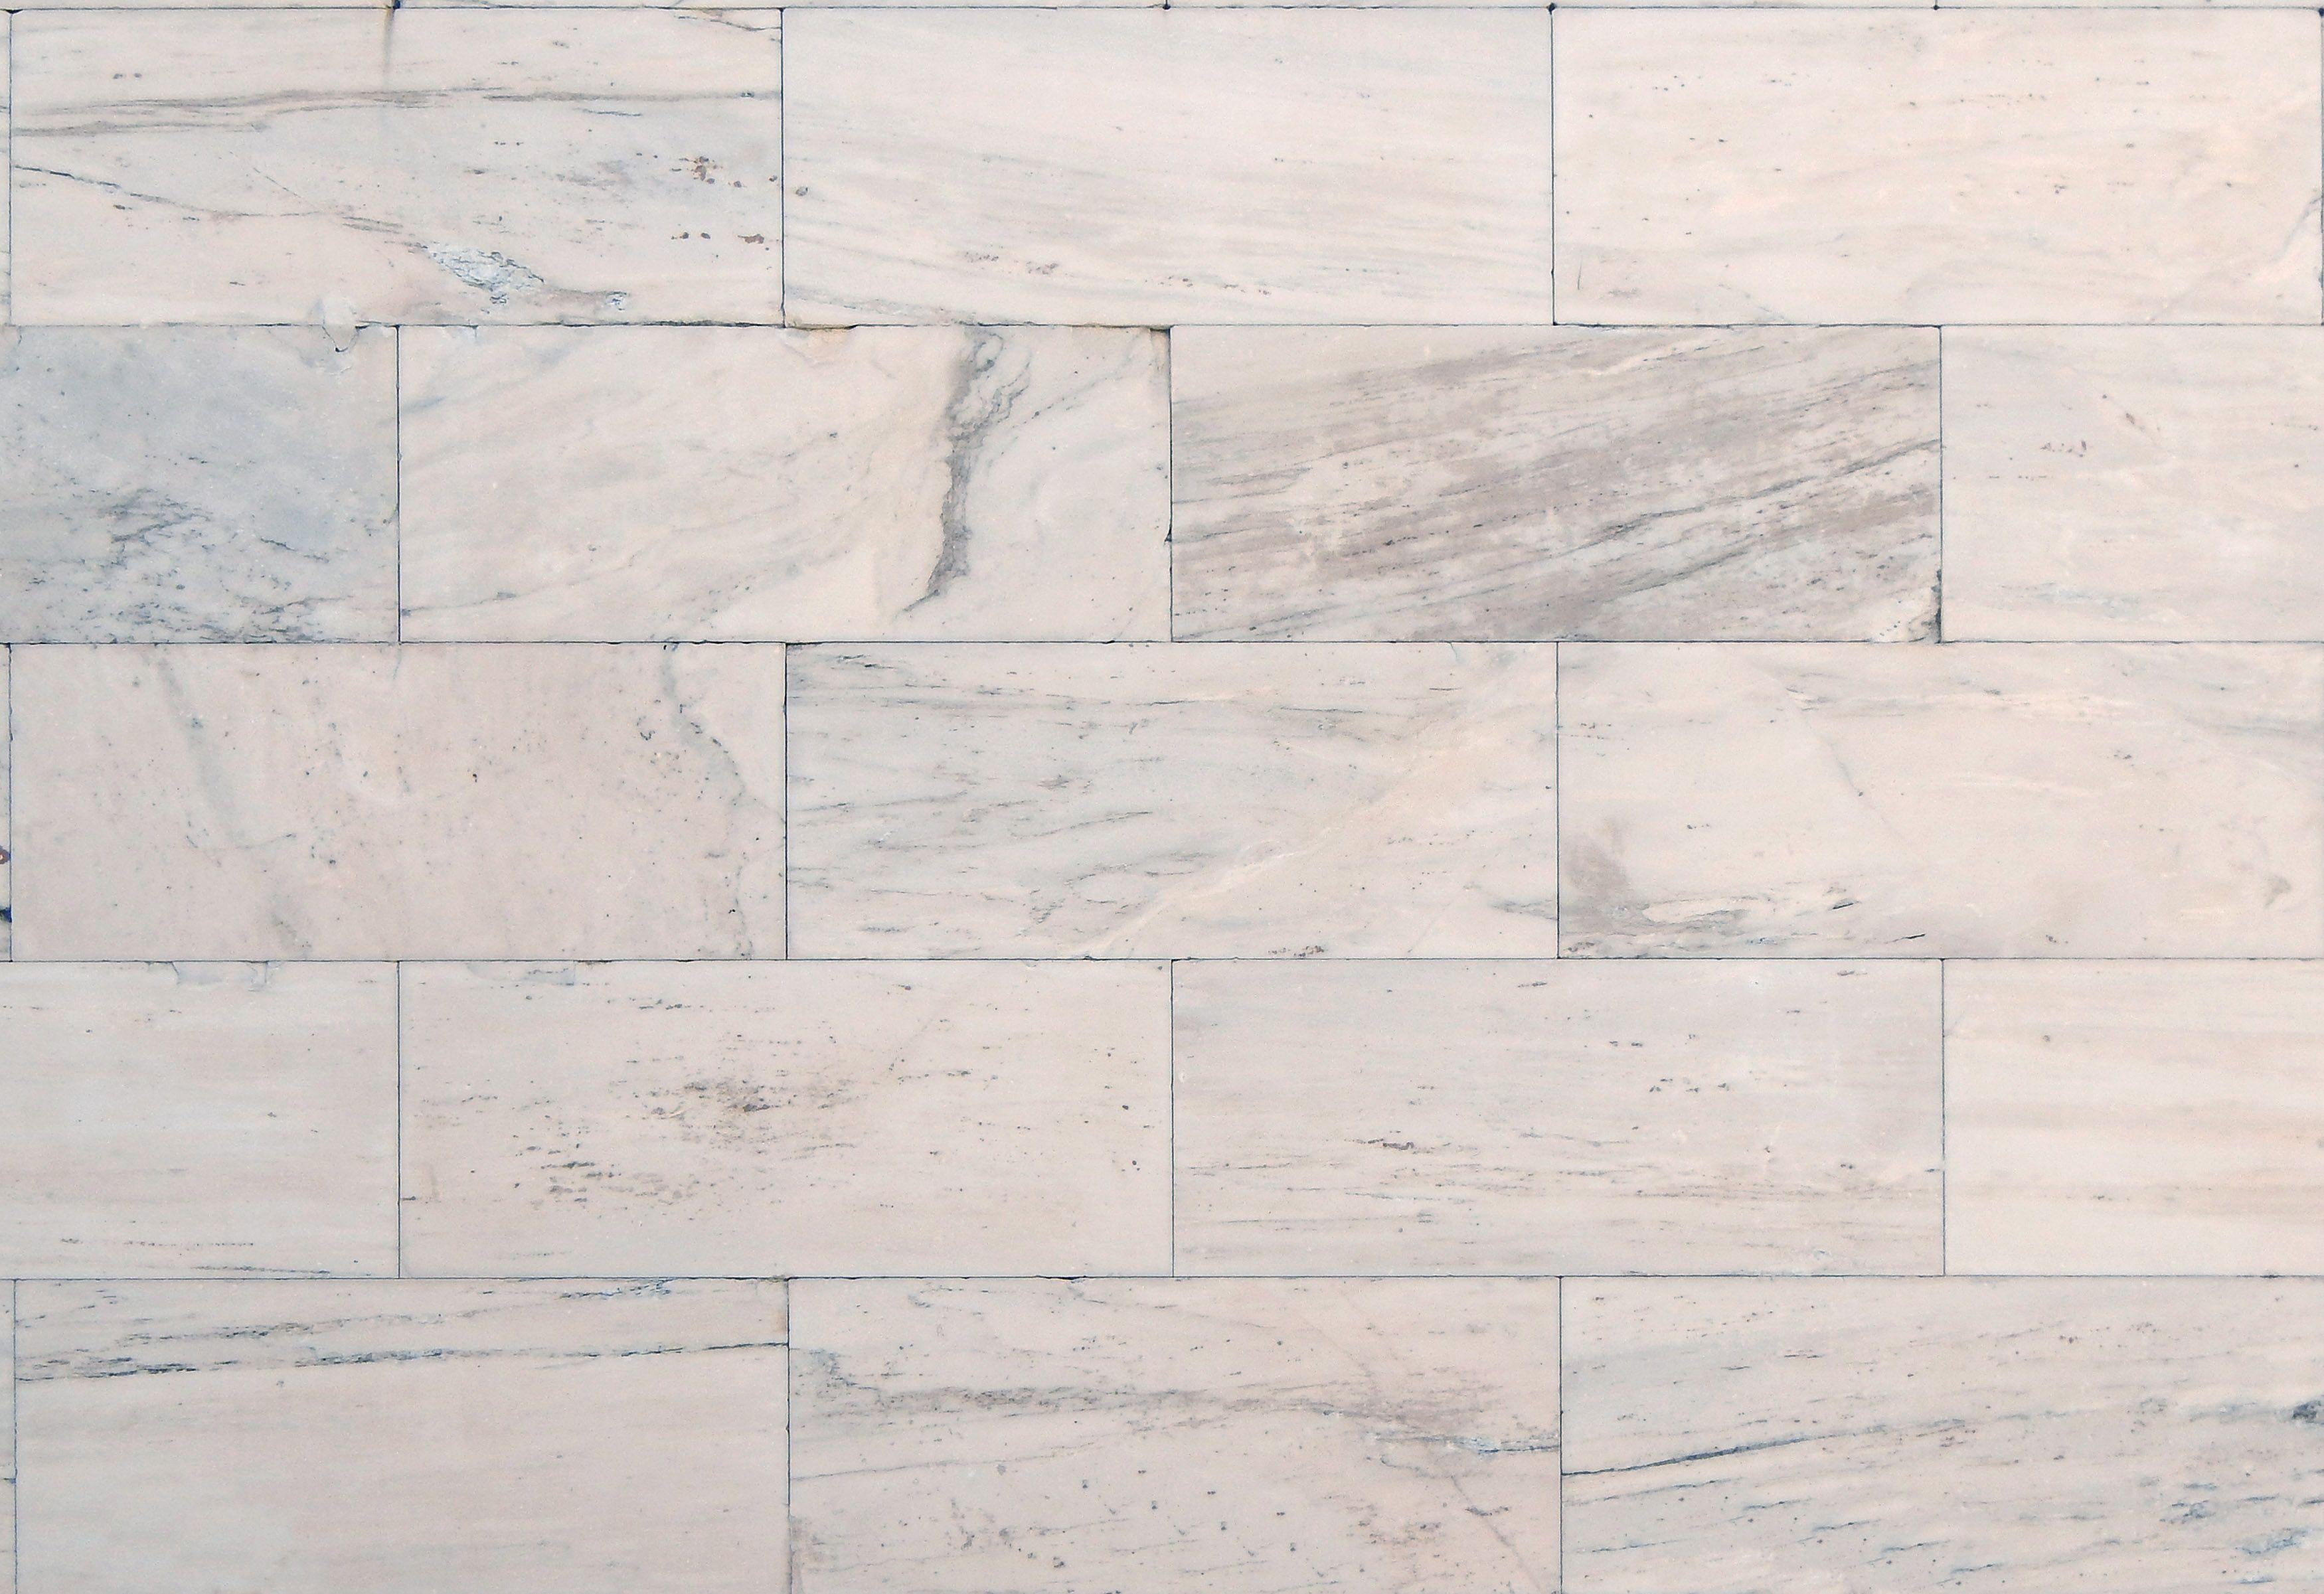 Marble Tile Floor Texture Best Decorating 75092 Decorating Ideas ...